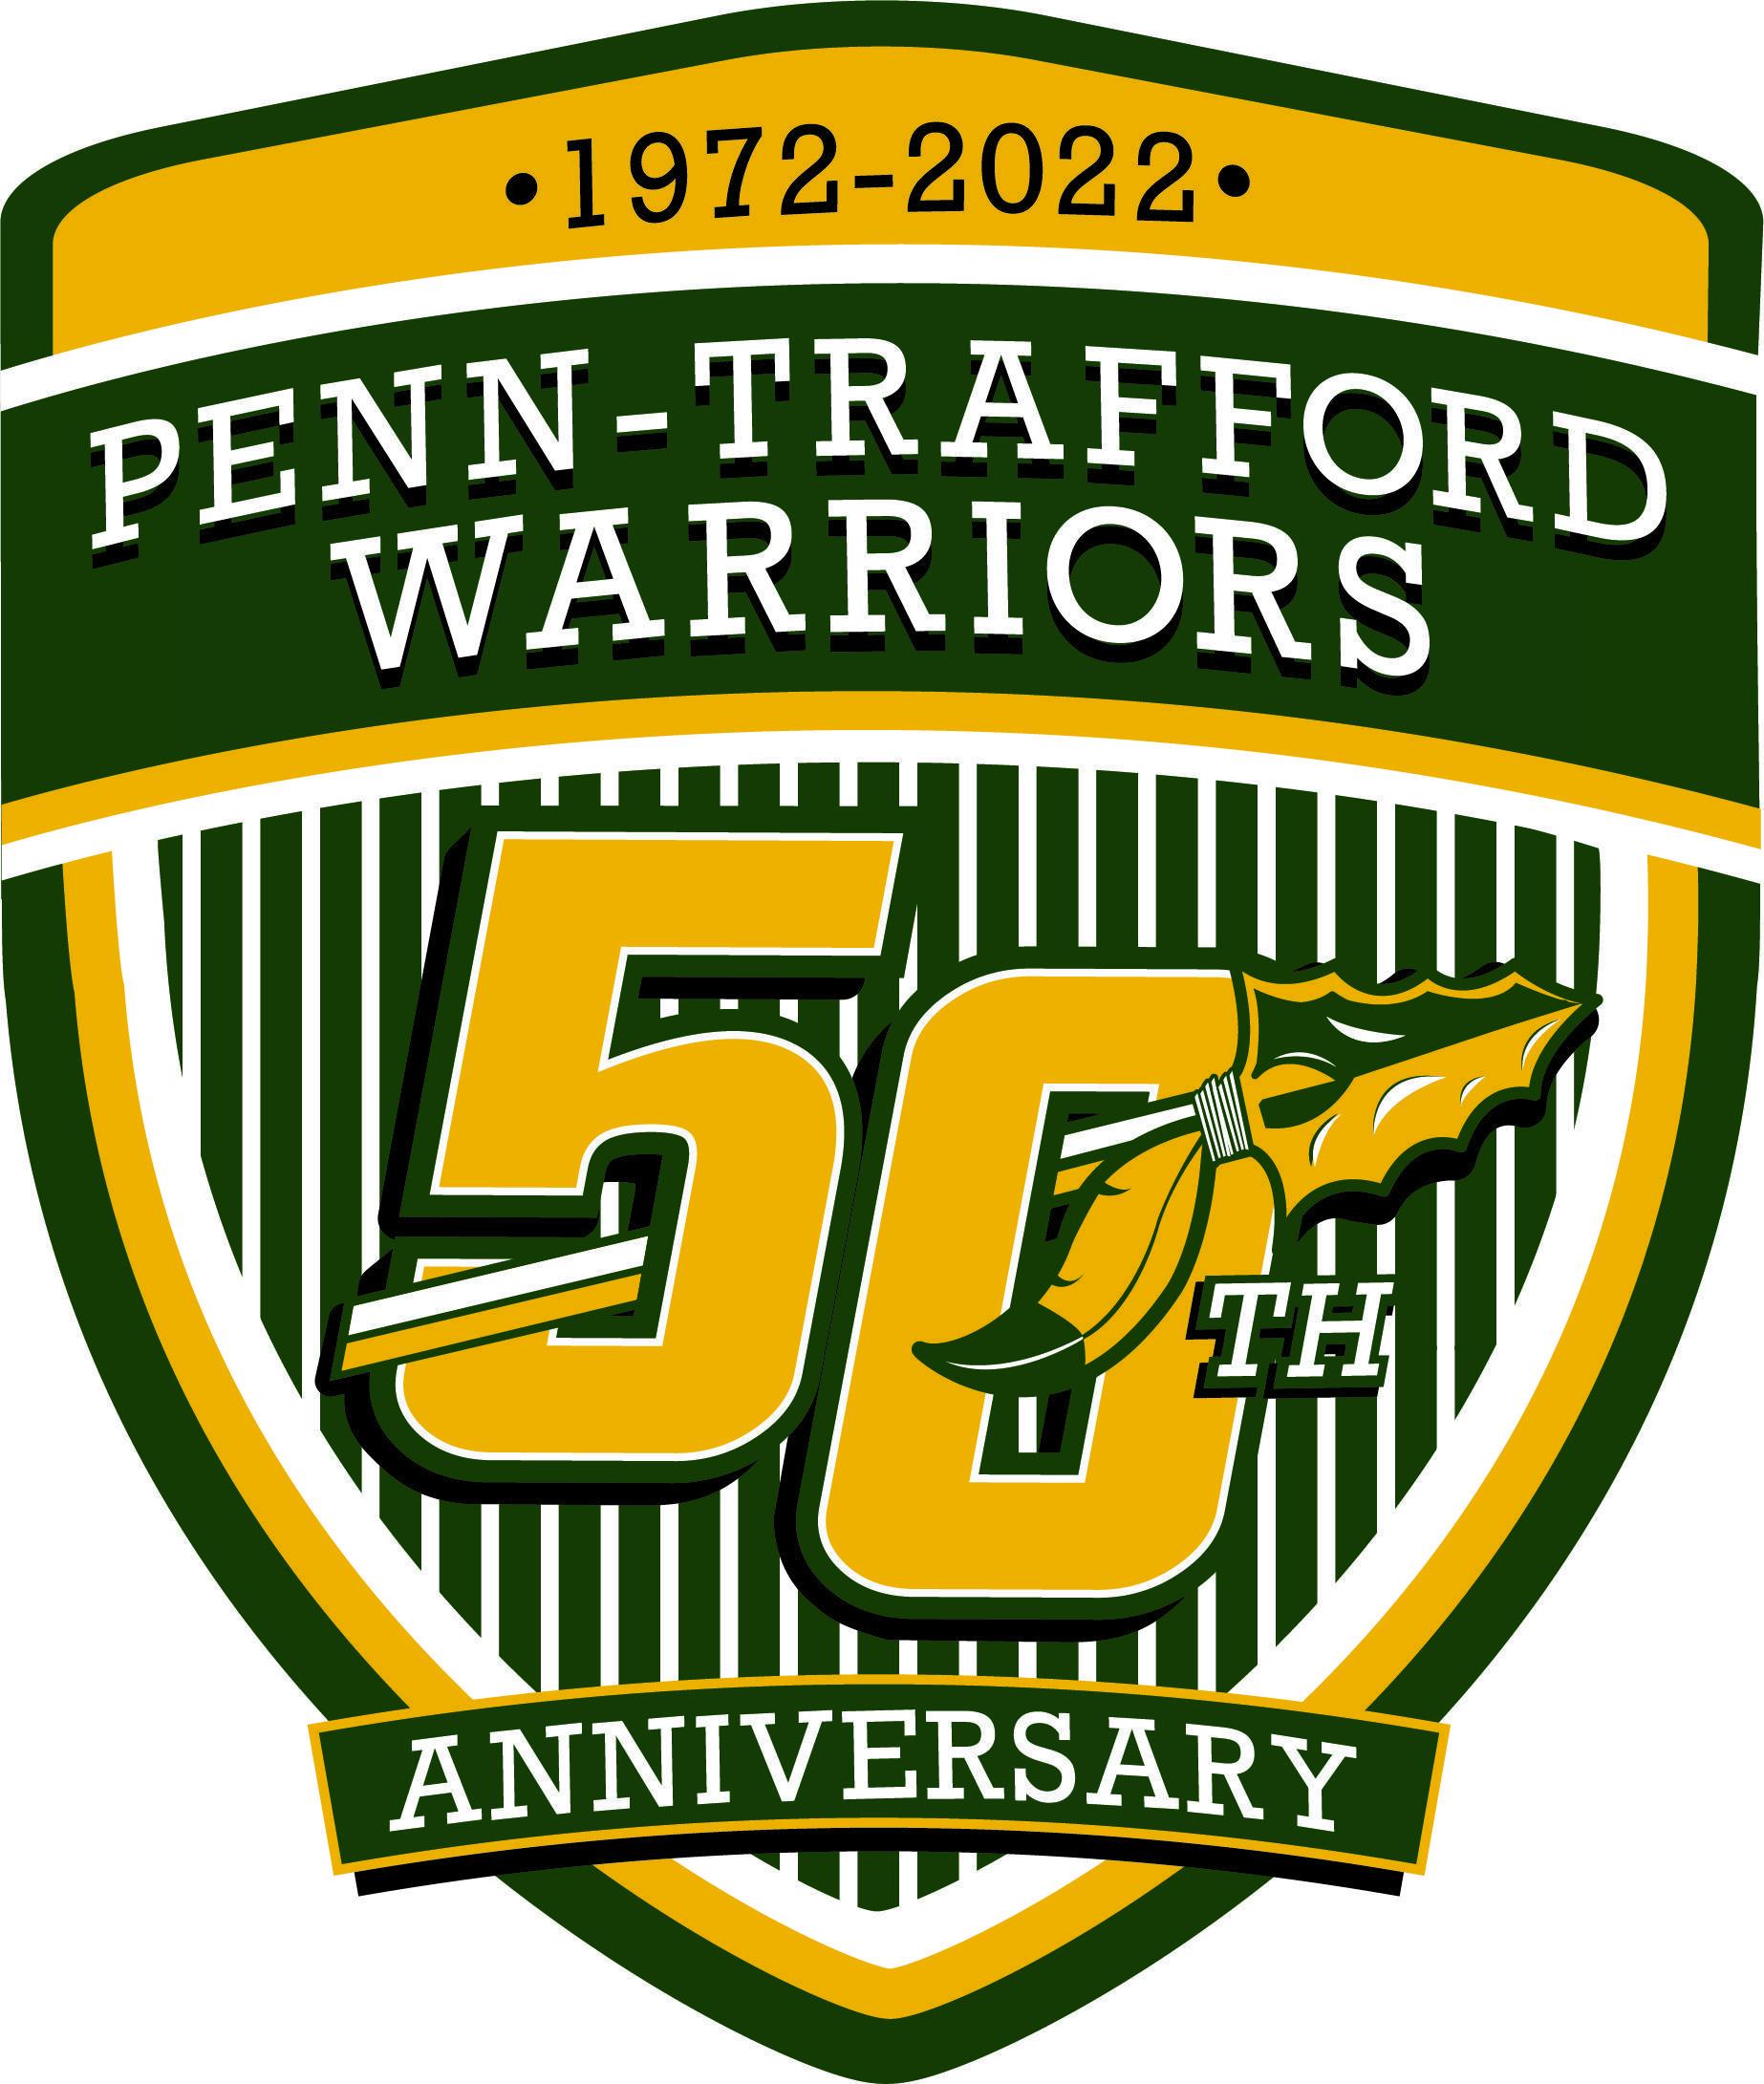 Penn-Trafford High School's 50th Anniversary